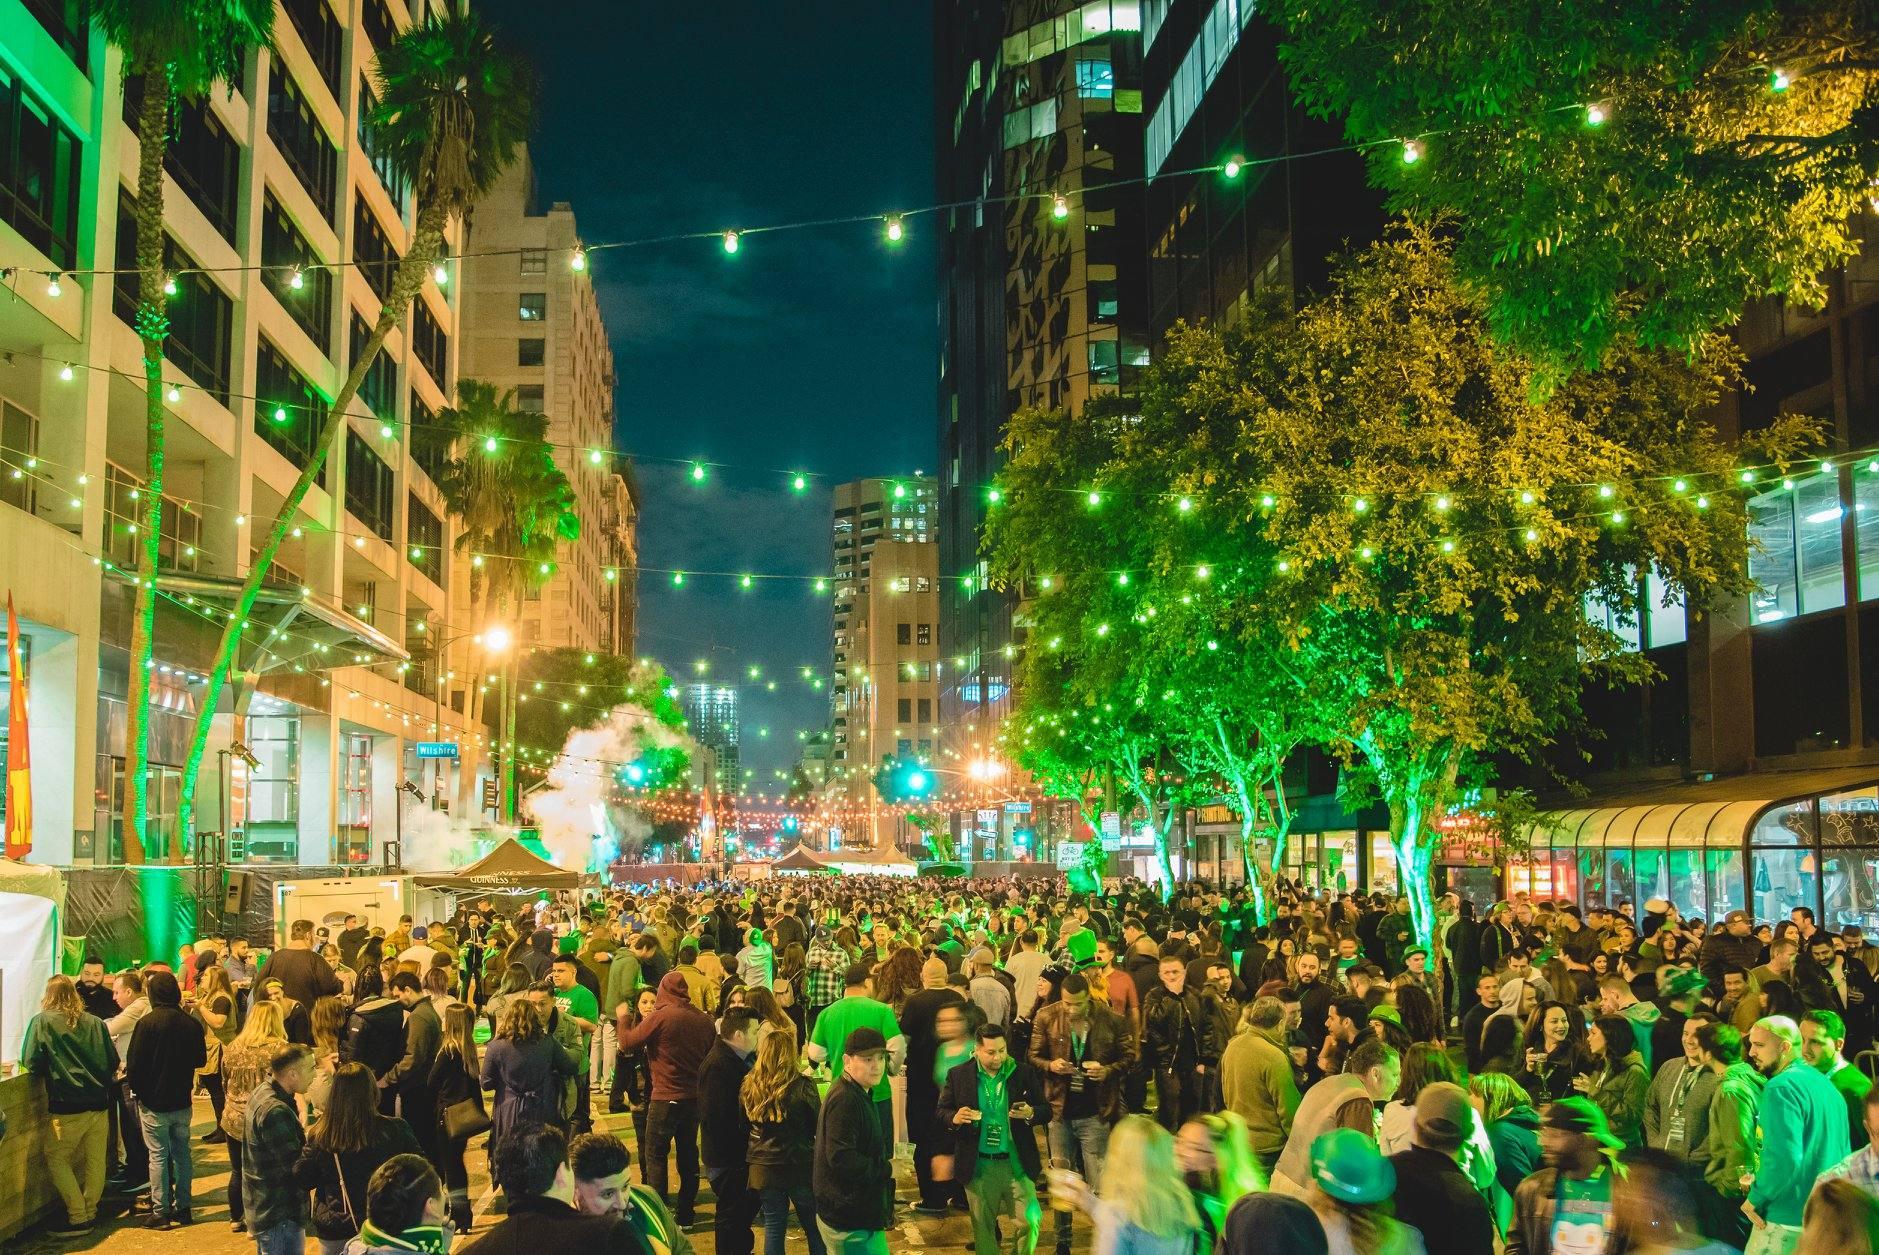 St. Patrick's Day Street Festival at Casey's Irish Pub